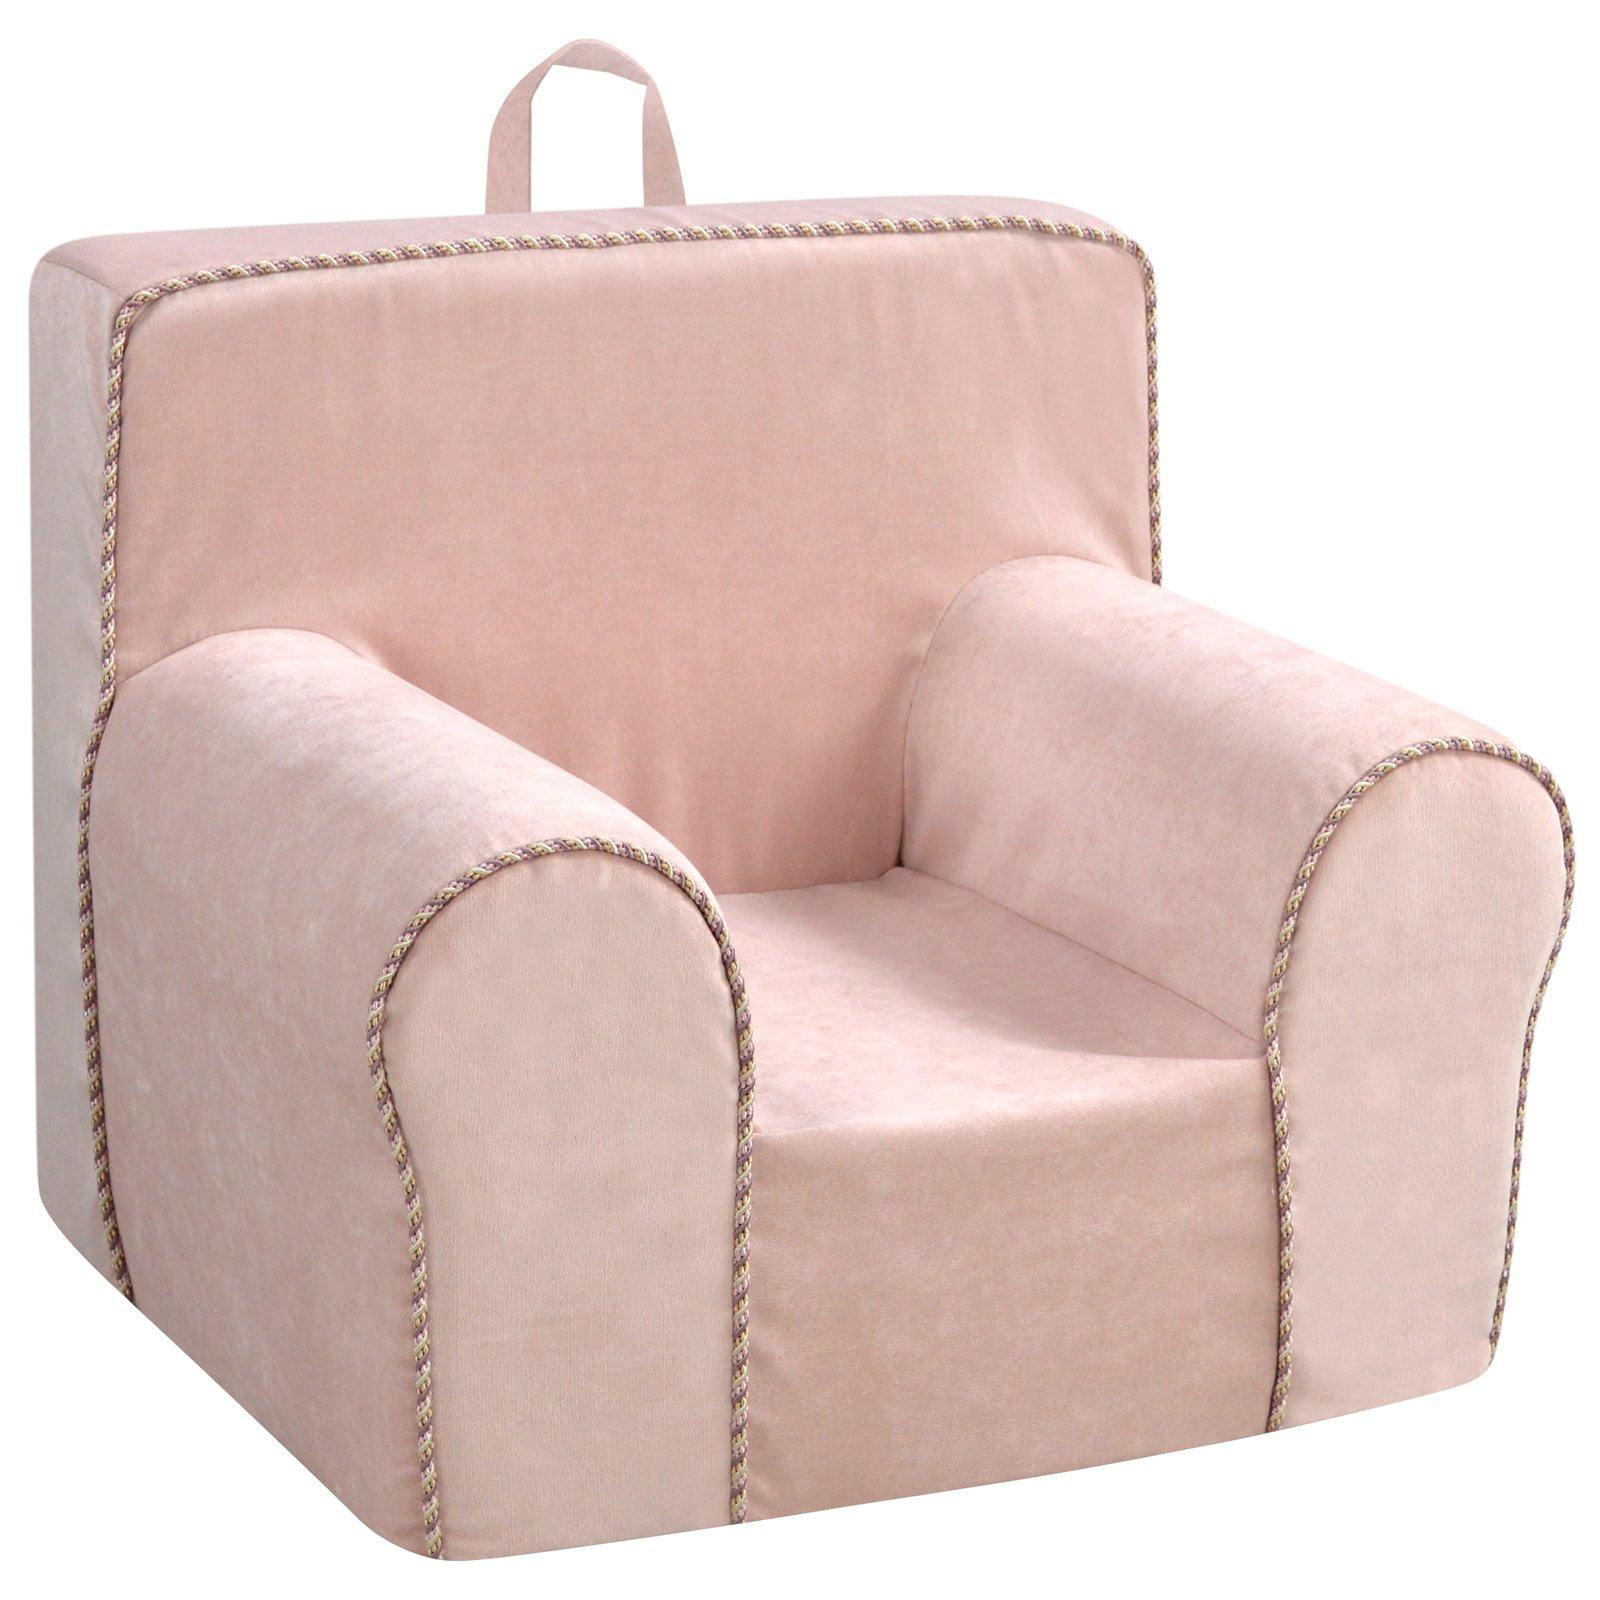 Kangaroo Trading Zamora Blush Grab-n-Go Foam Kids Chair with Handle